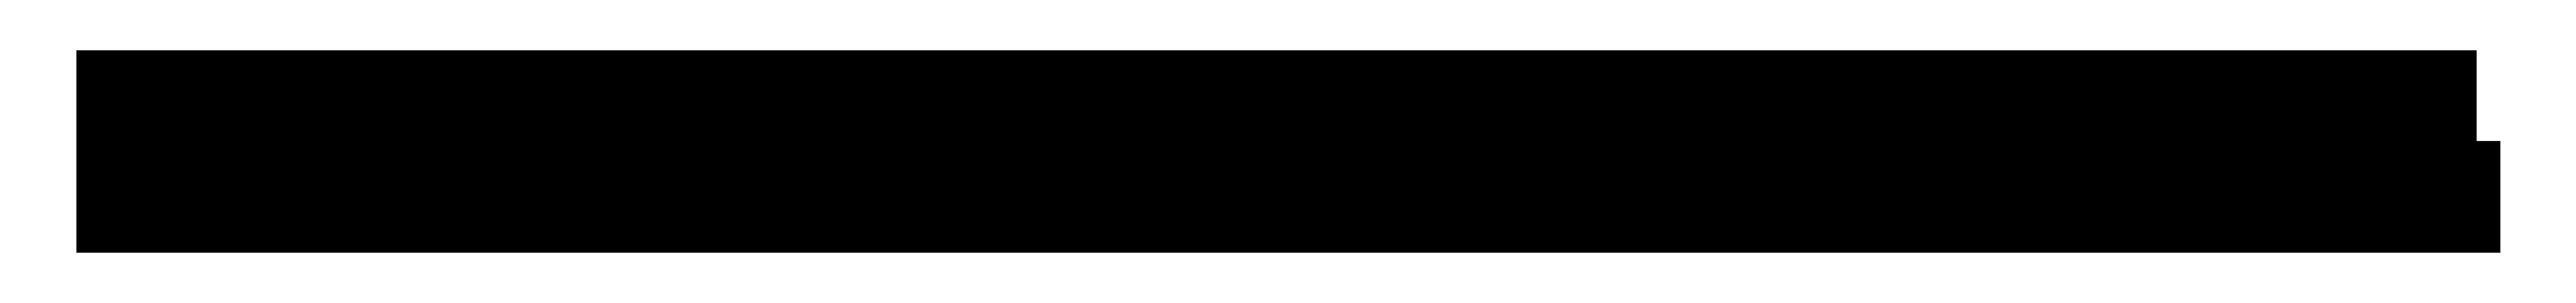 marieberg köpcentrum adress